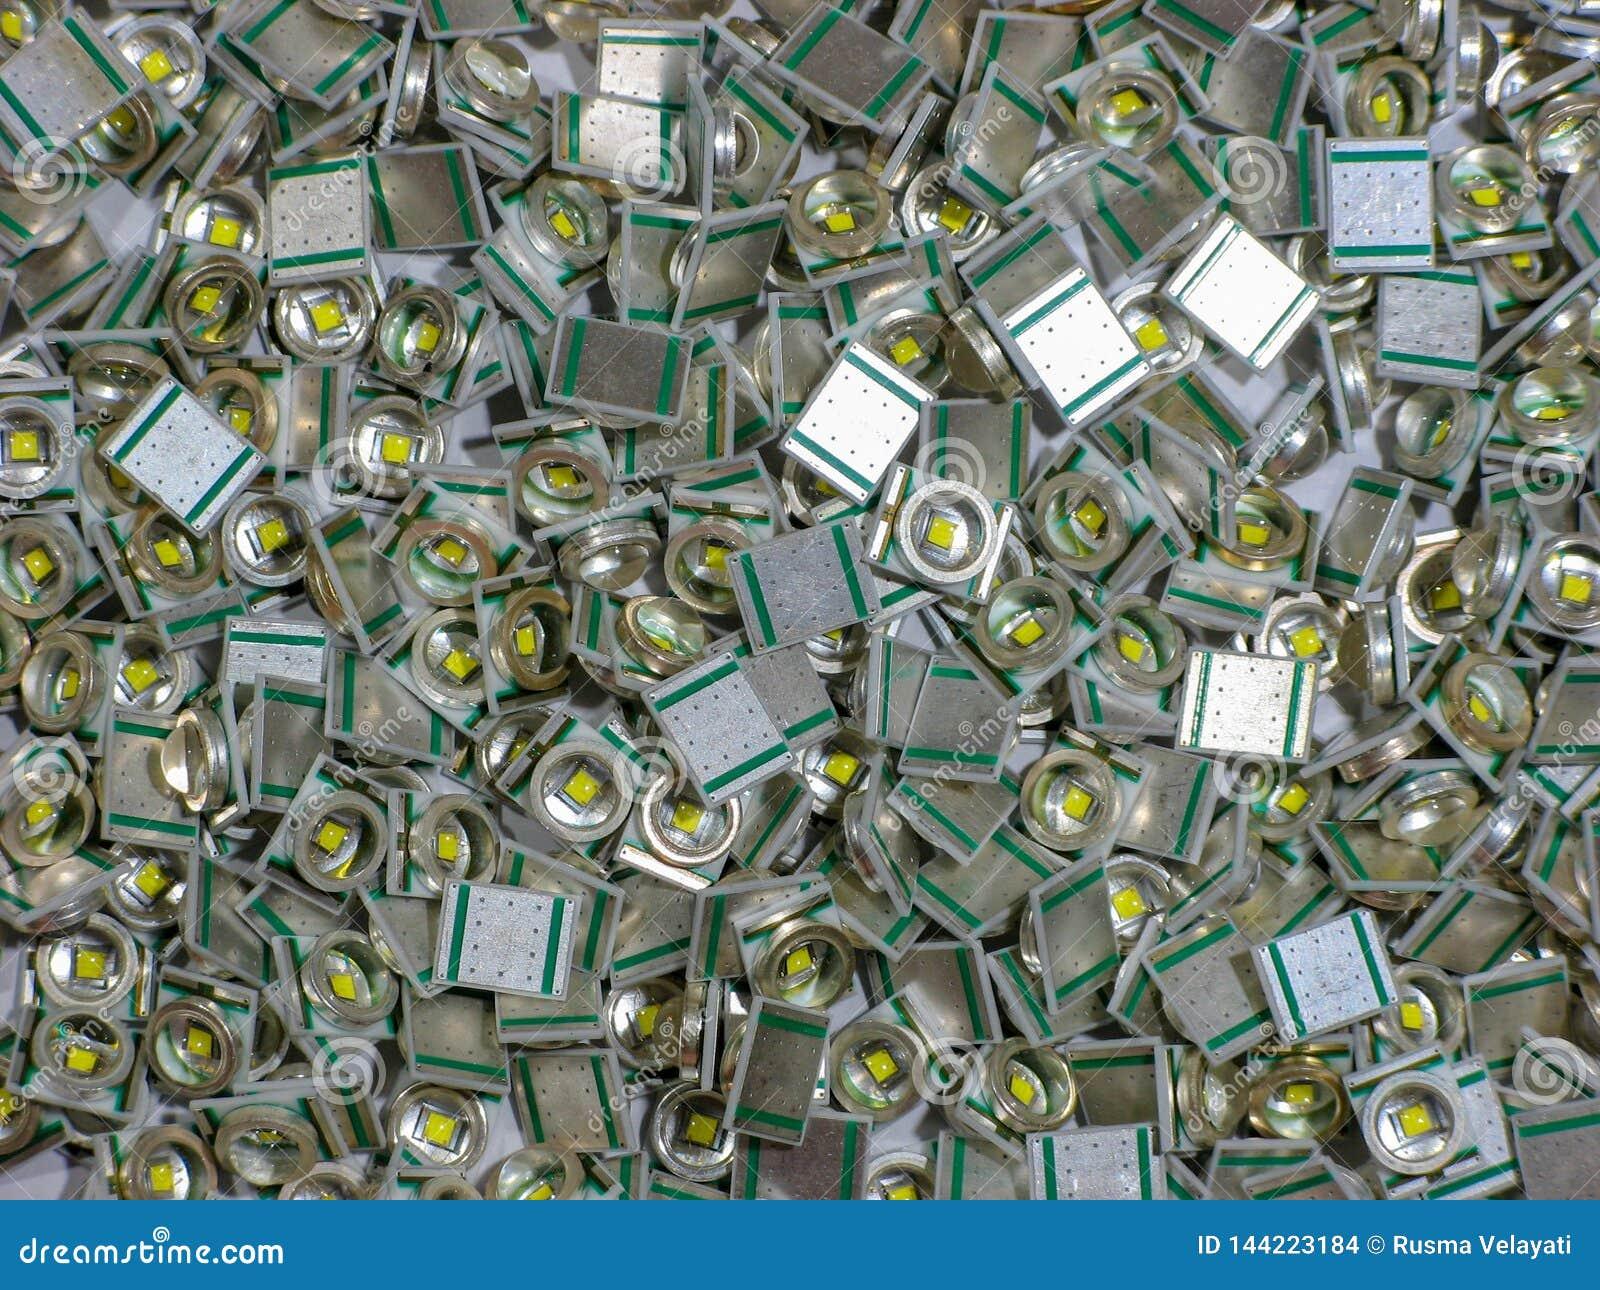 Photo of many square LED lights